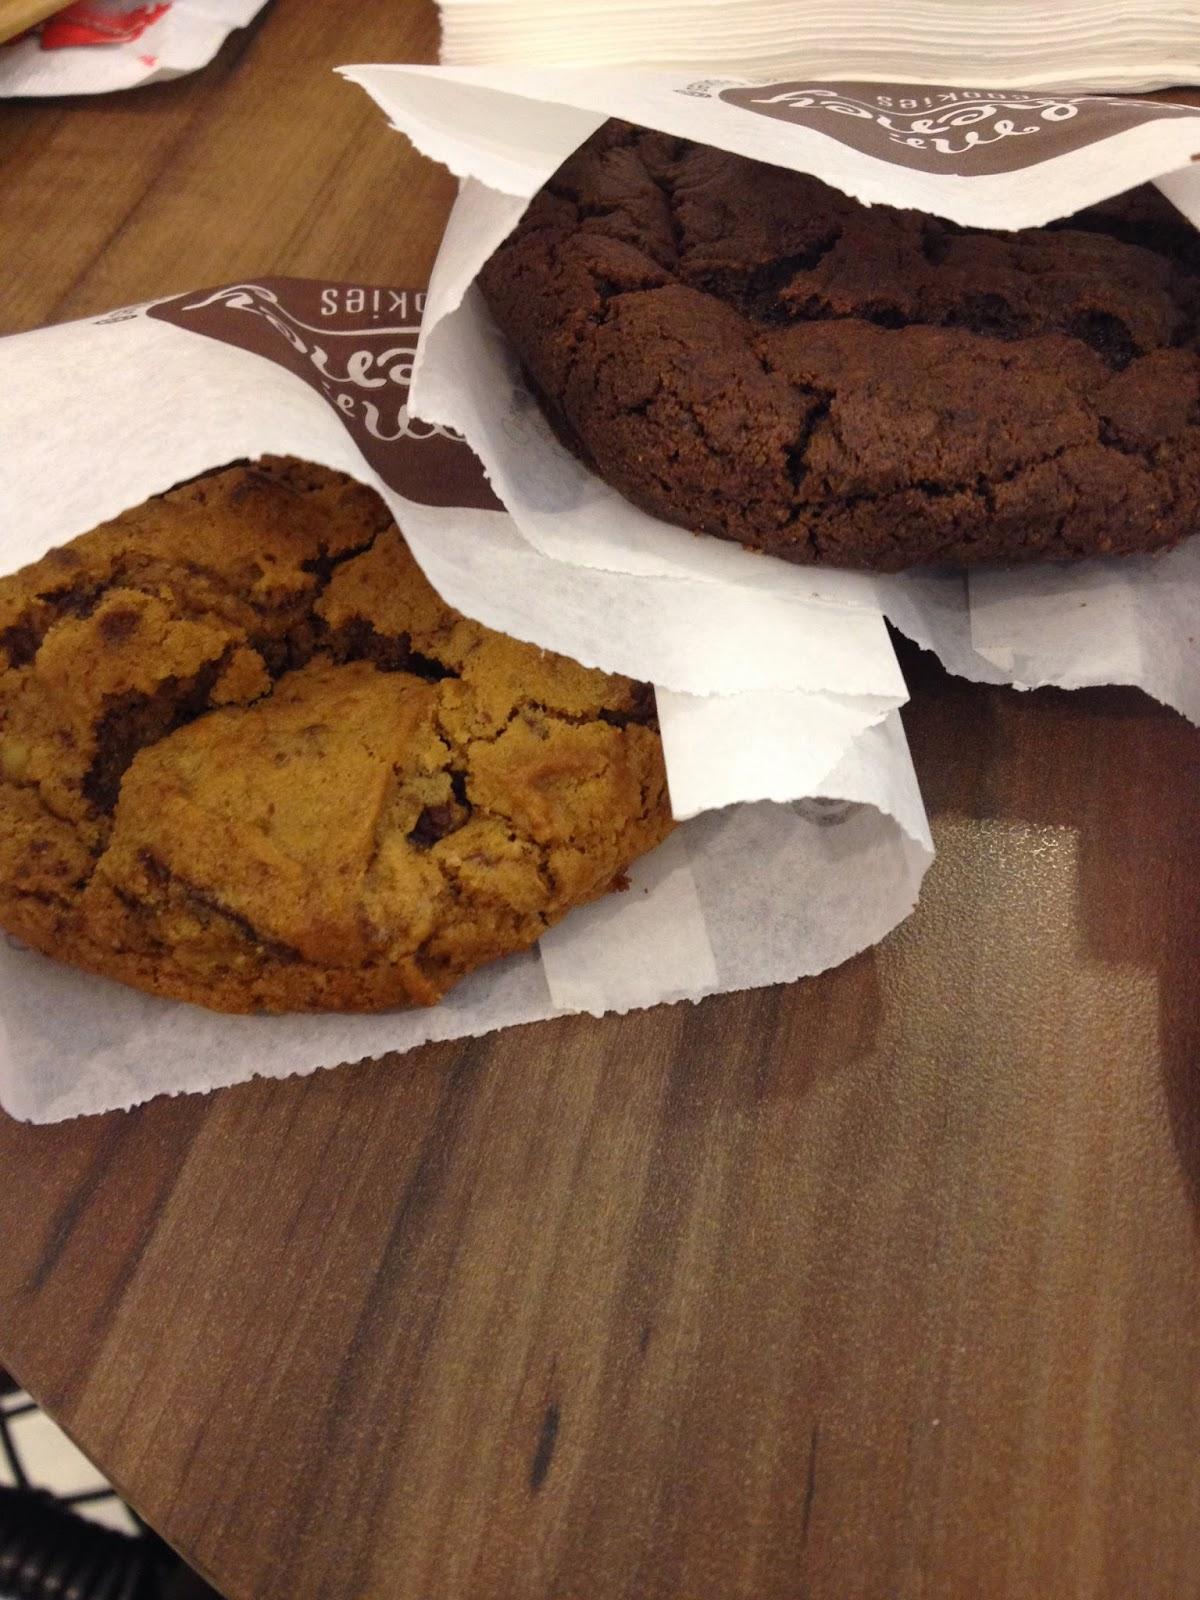 MR+CHENEY Receita: Chocolate Chip Cookies com Nozes do Mr. Cheney